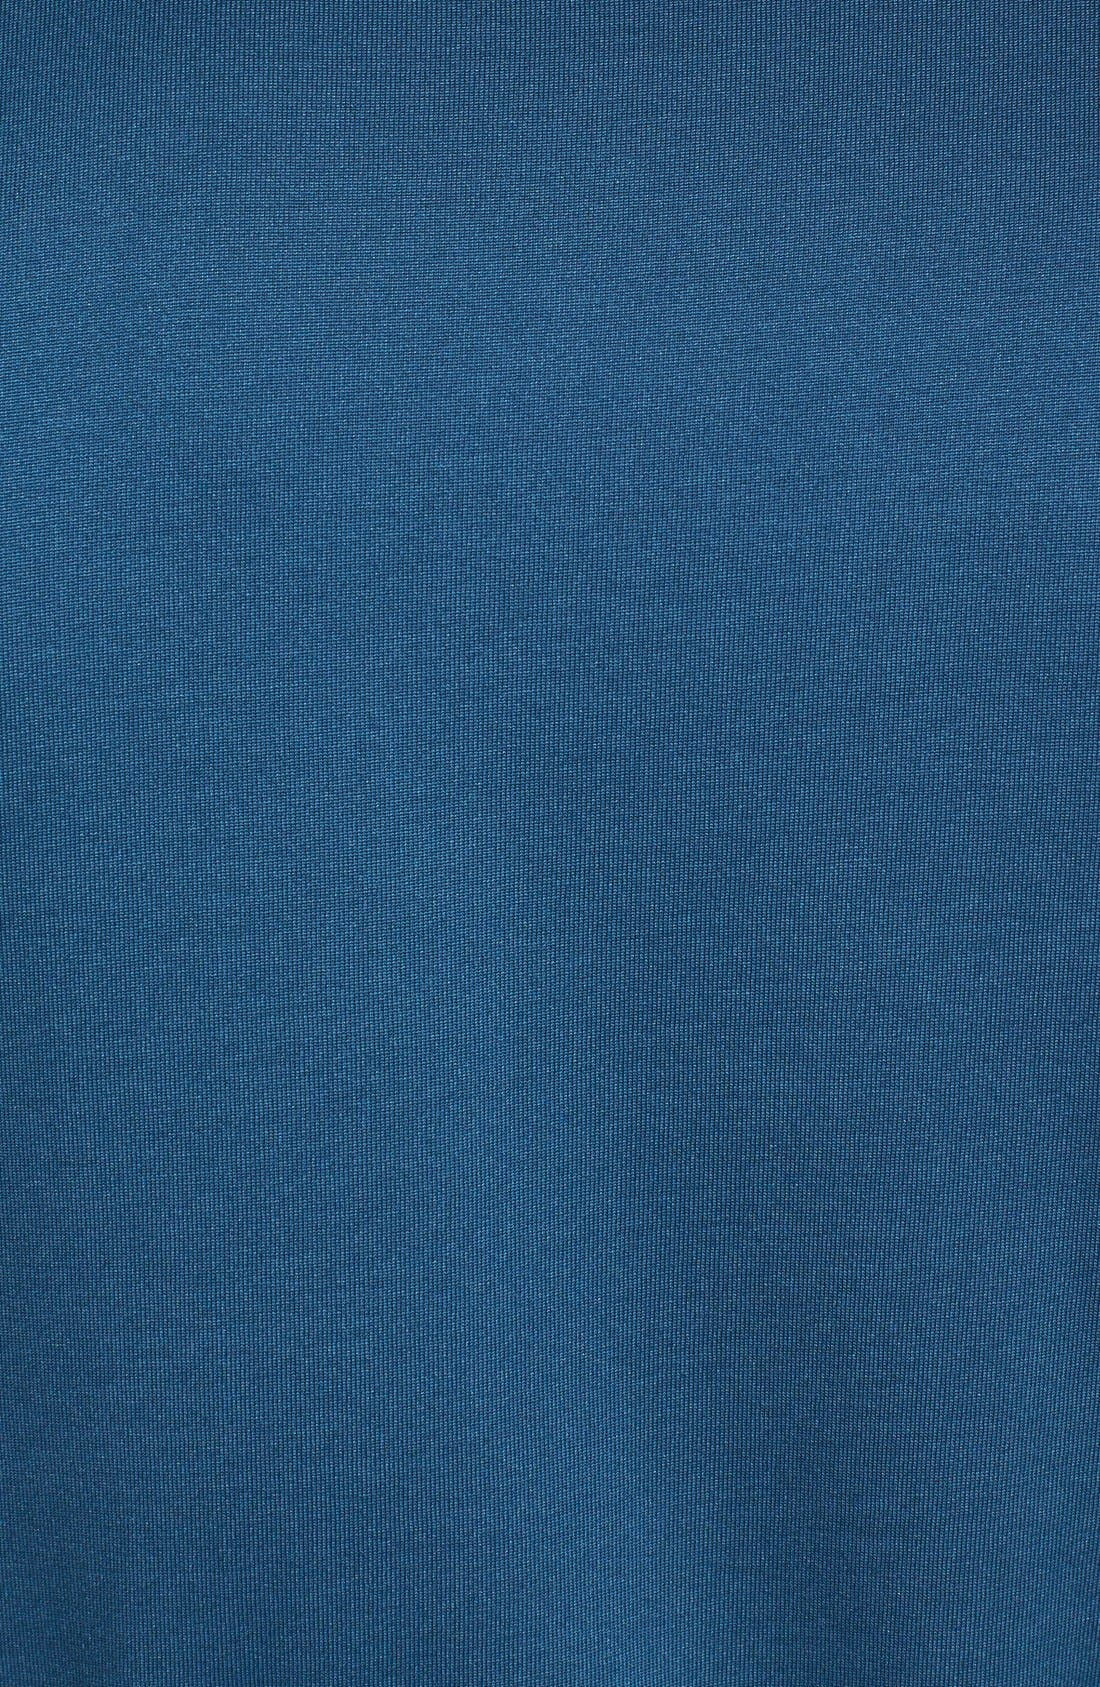 Alternate Image 3  - Travis Mathew 'Lowe' Regular Fit Polo